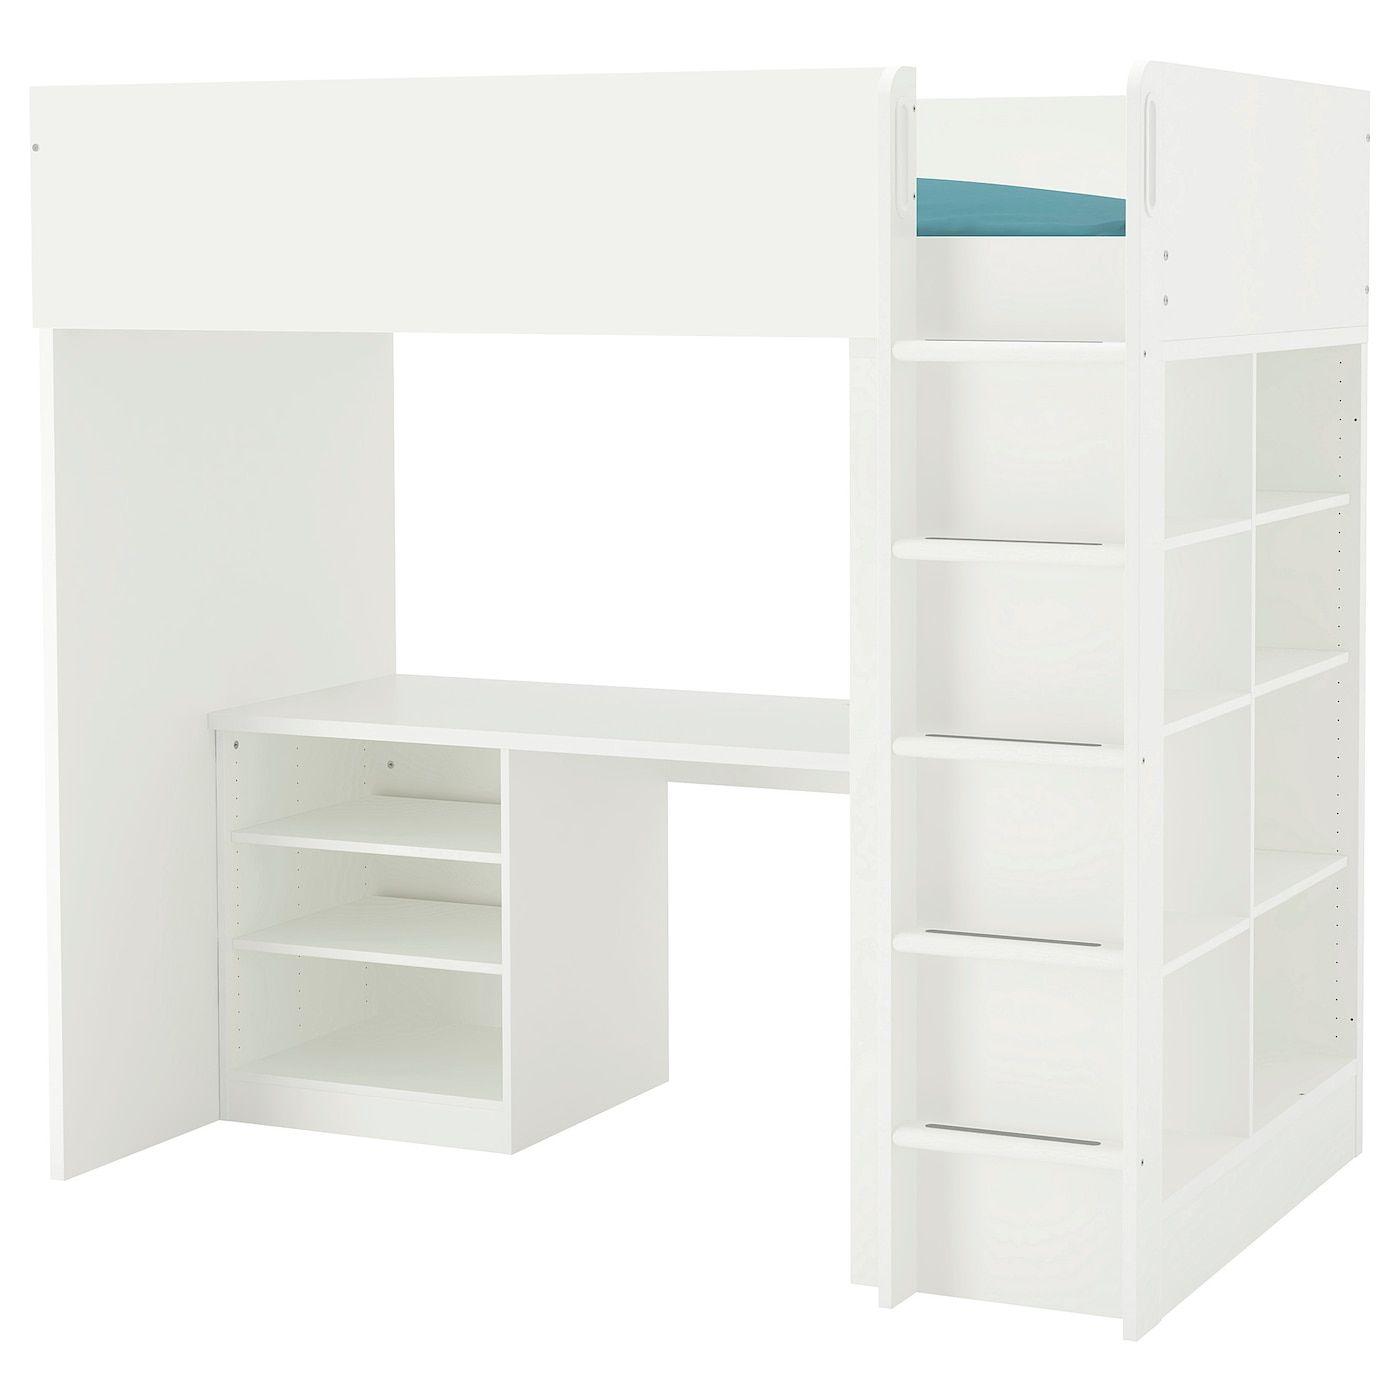 Ikea Stuva Loft Bed Combo W 2 Shlvs 3 Shlvs White With This